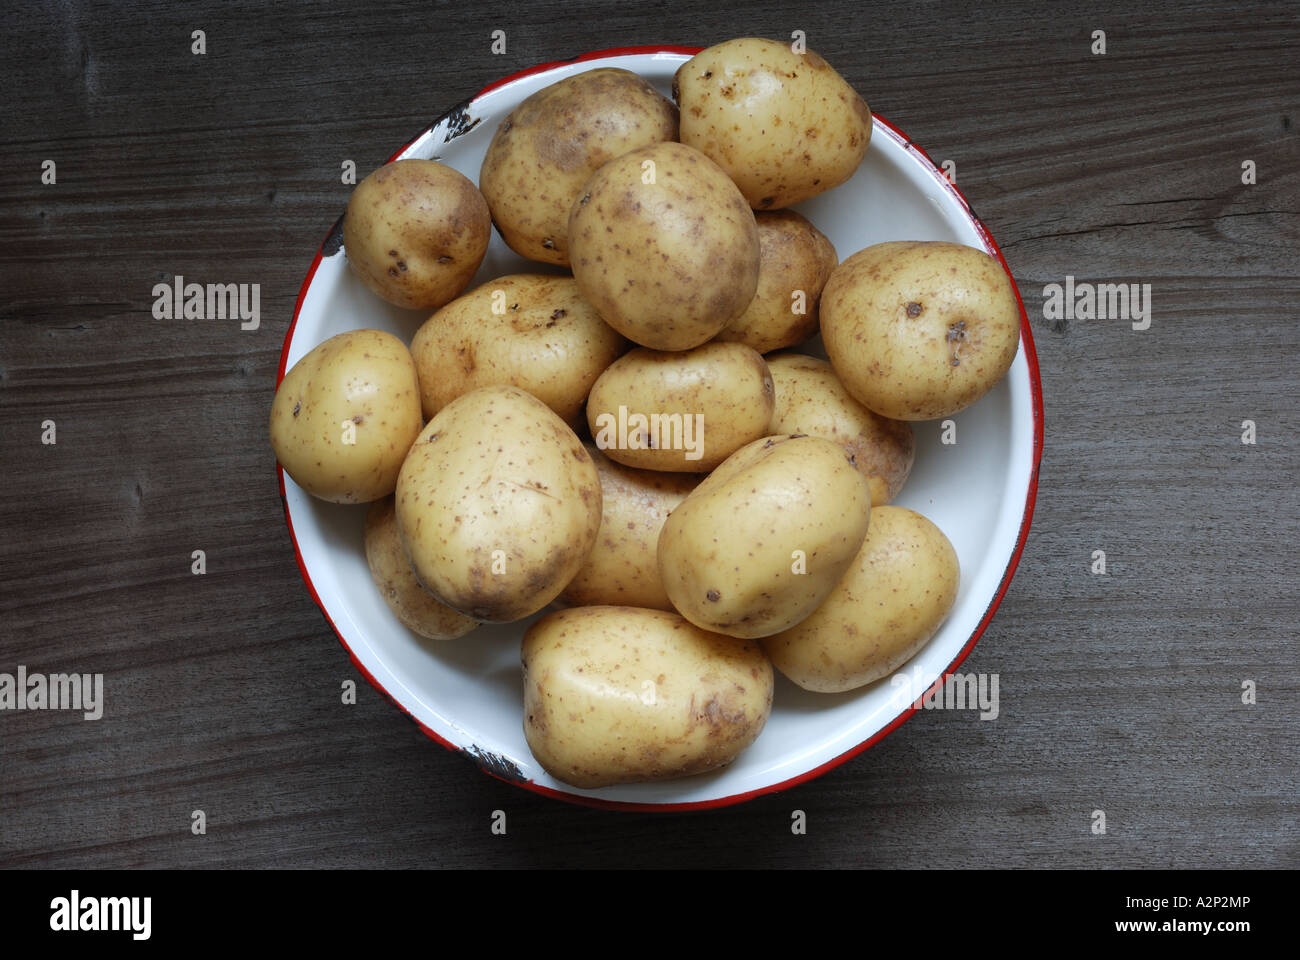 Potatoes variety Vivaldi - Stock Image